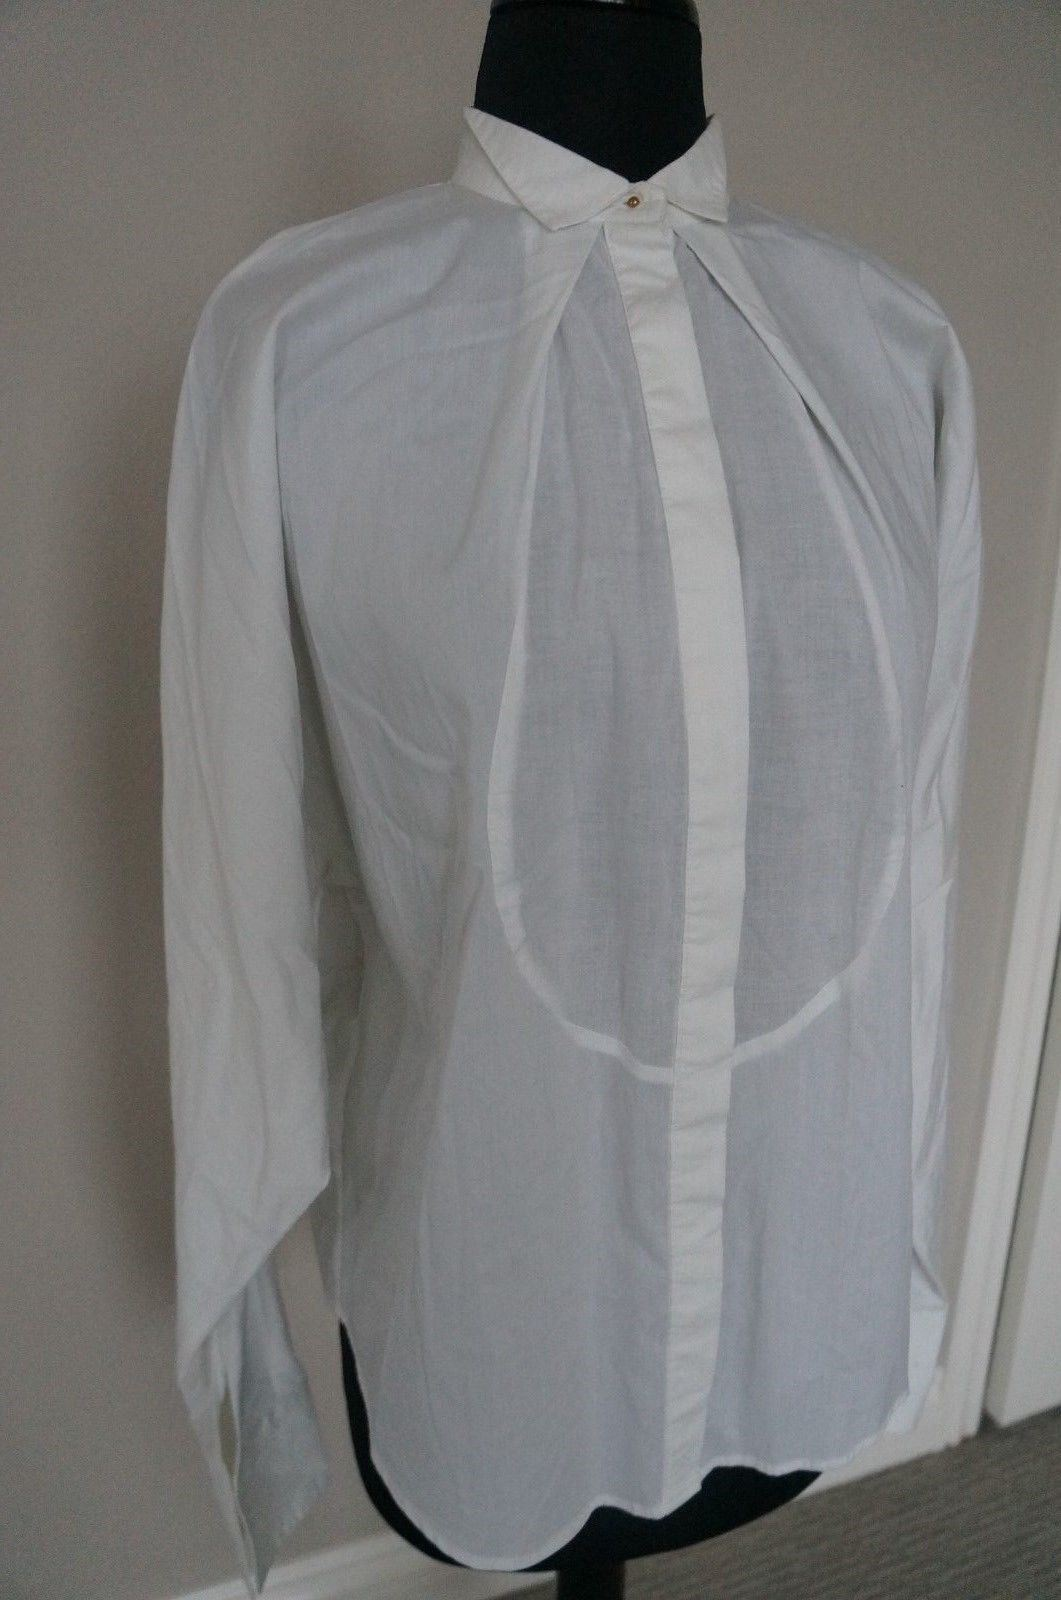 NEW Anthropologie Day Birger Mikkelsen White Button Down Blouse Dress Shirt S